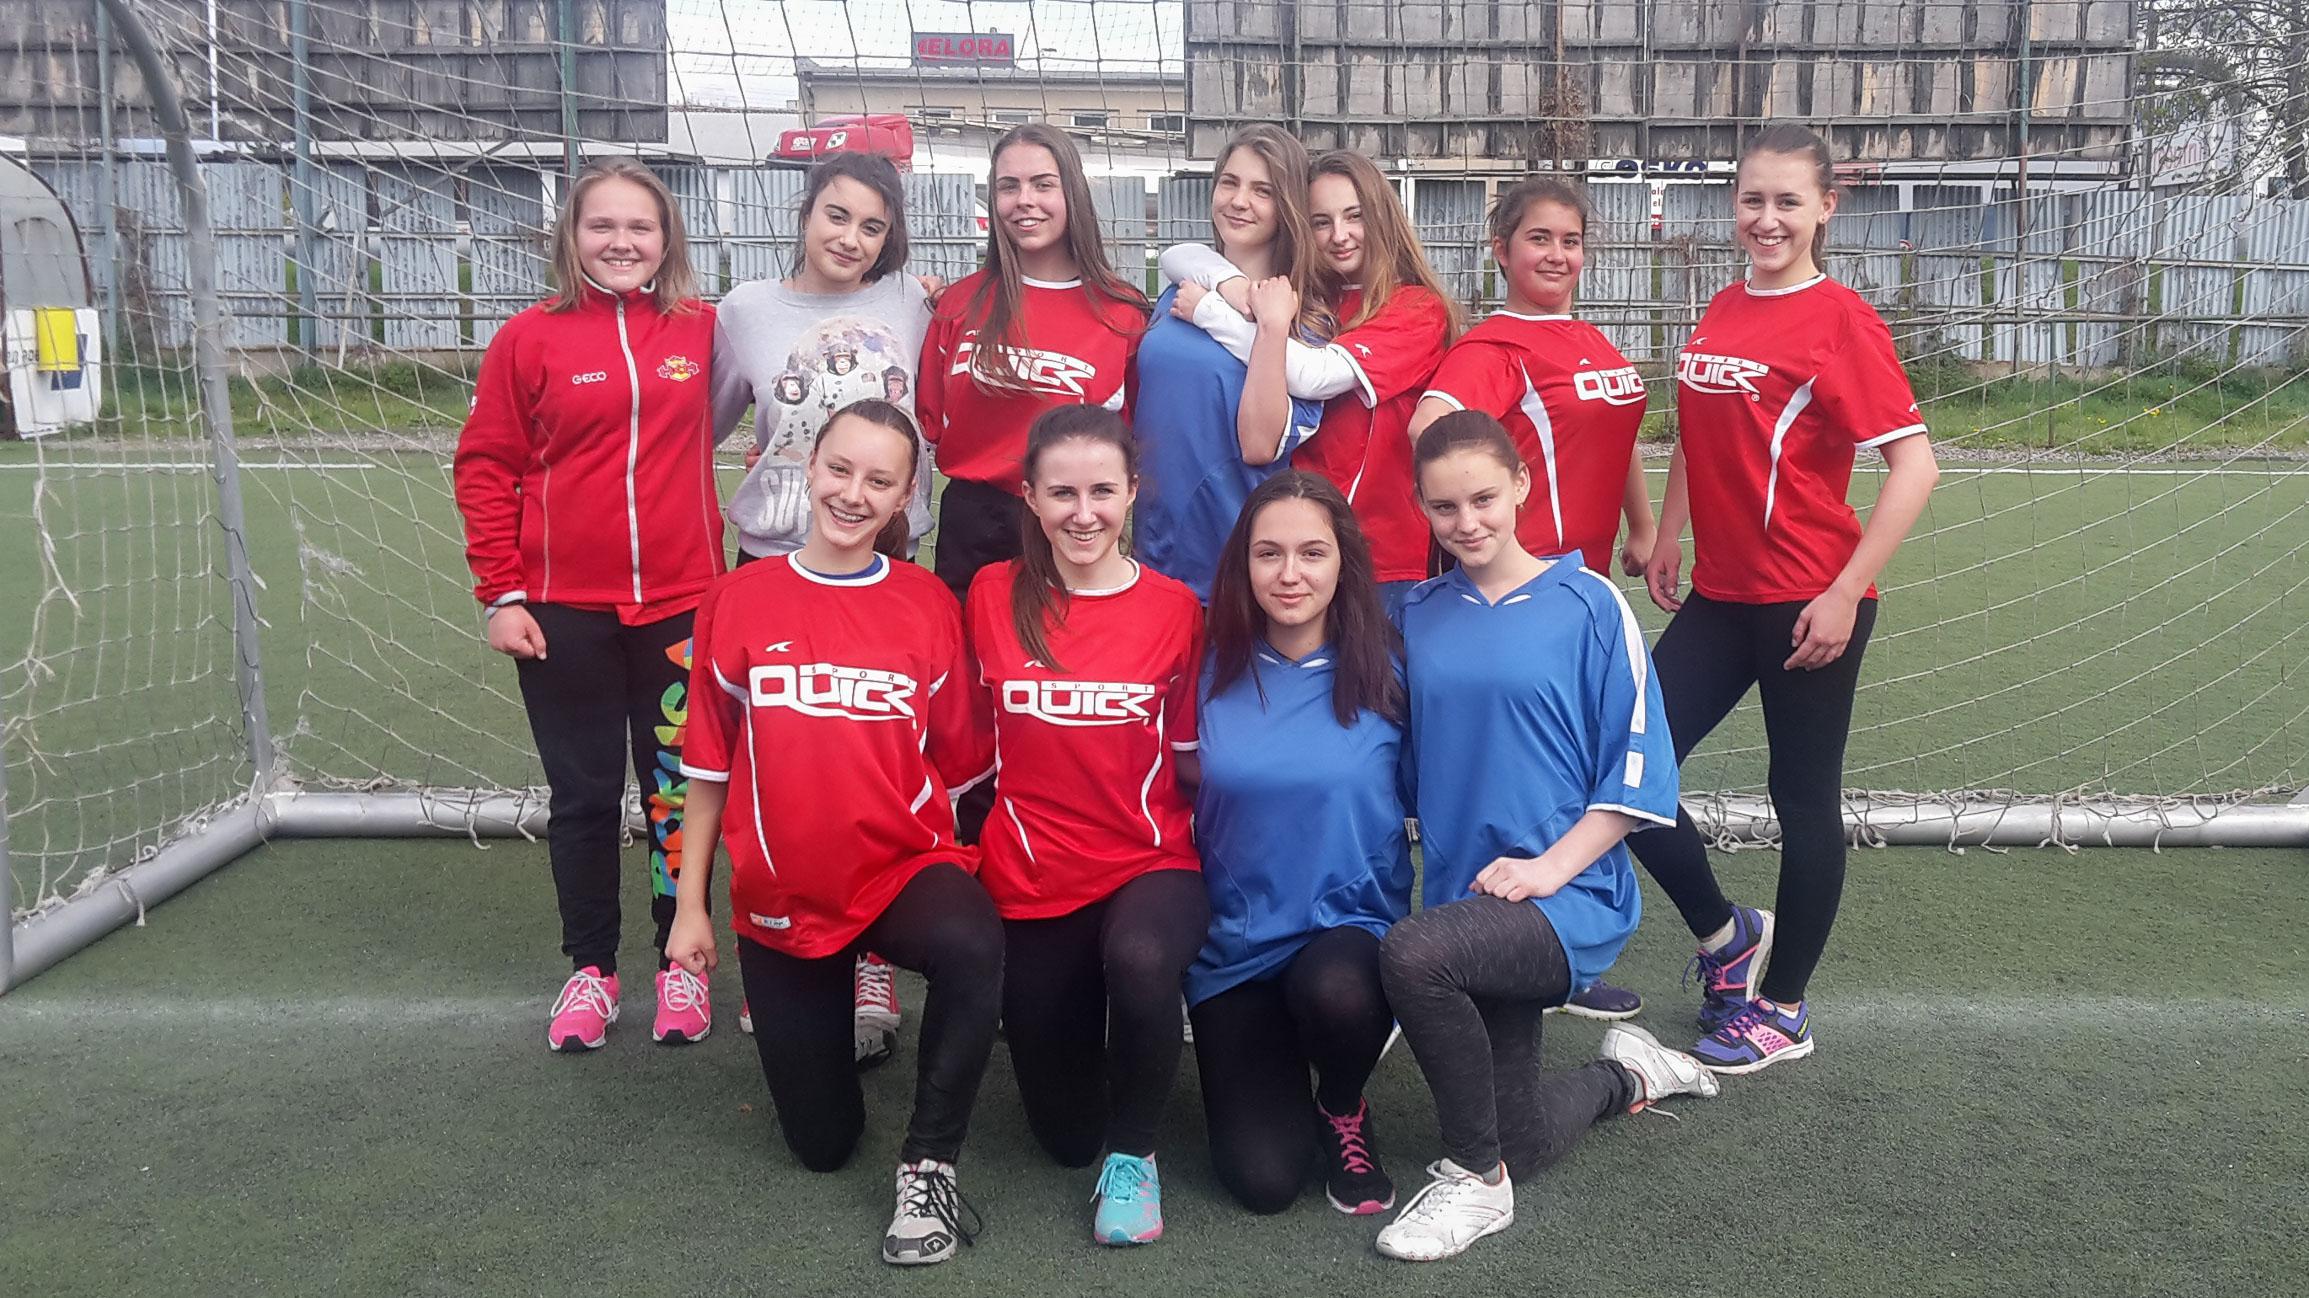 futbal-cup-zv-ziacky-jilemnickeho-2